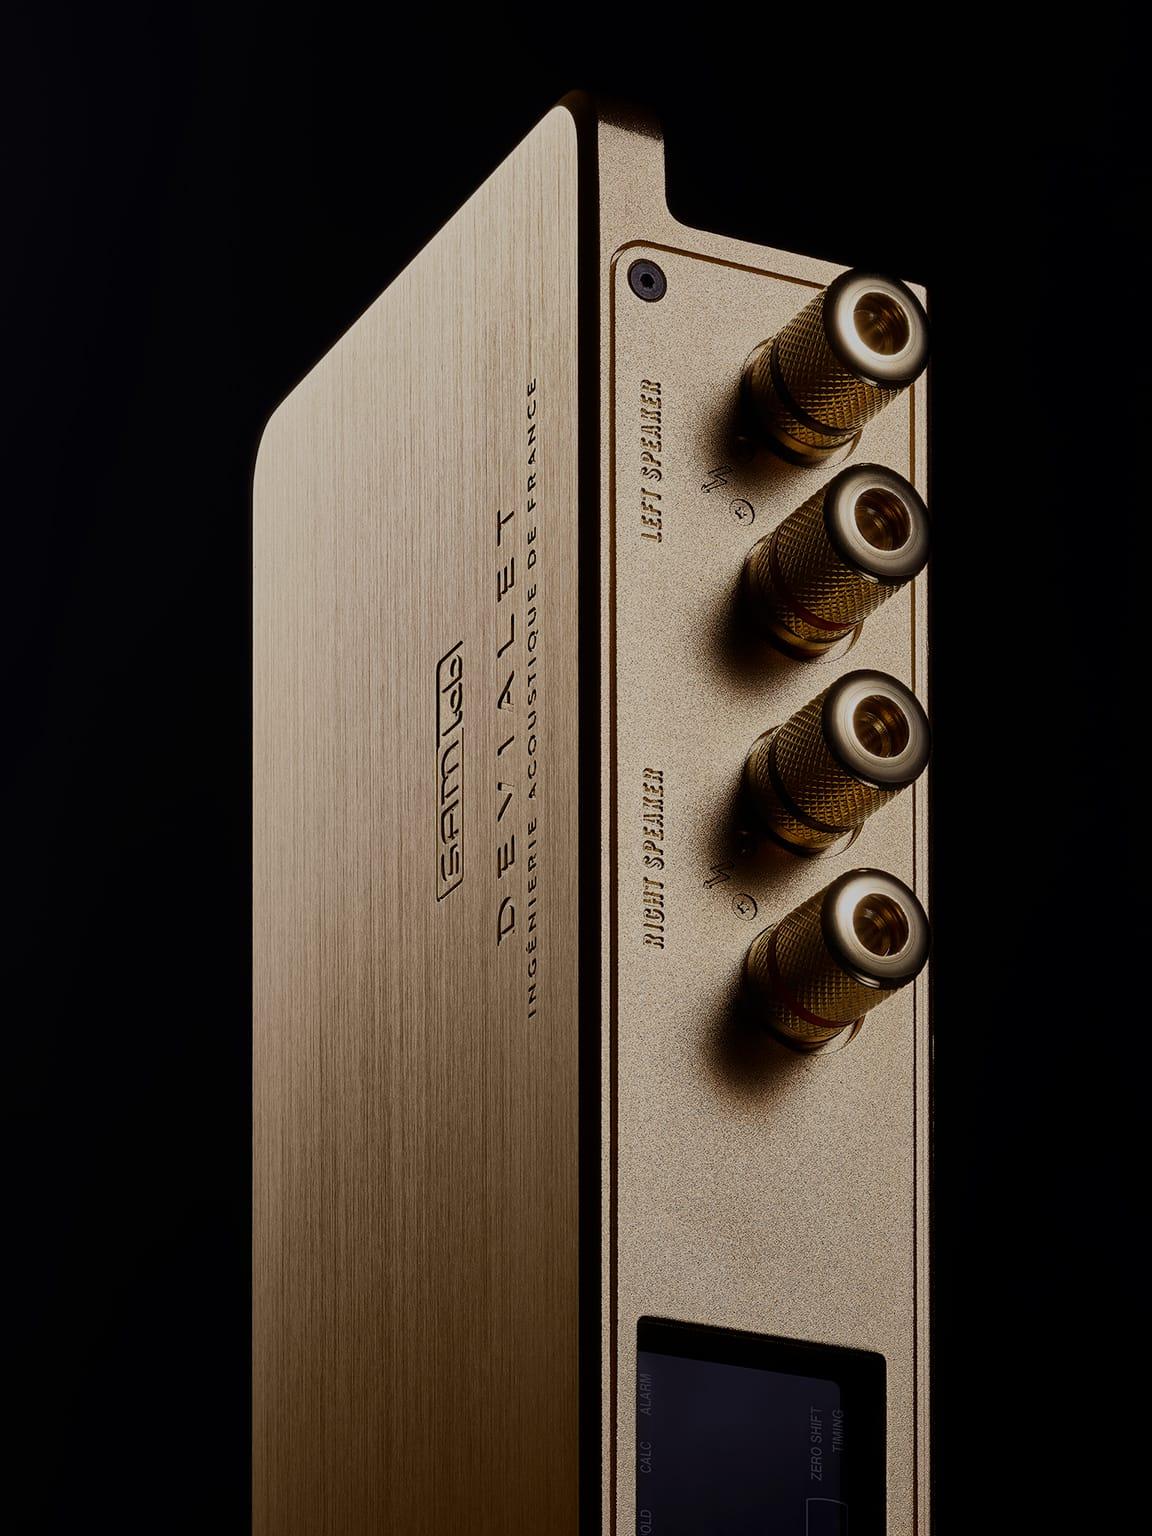 Your Sam Ready Compatible Speakers Devialet Er Advance R1 Expert Pro Samlab